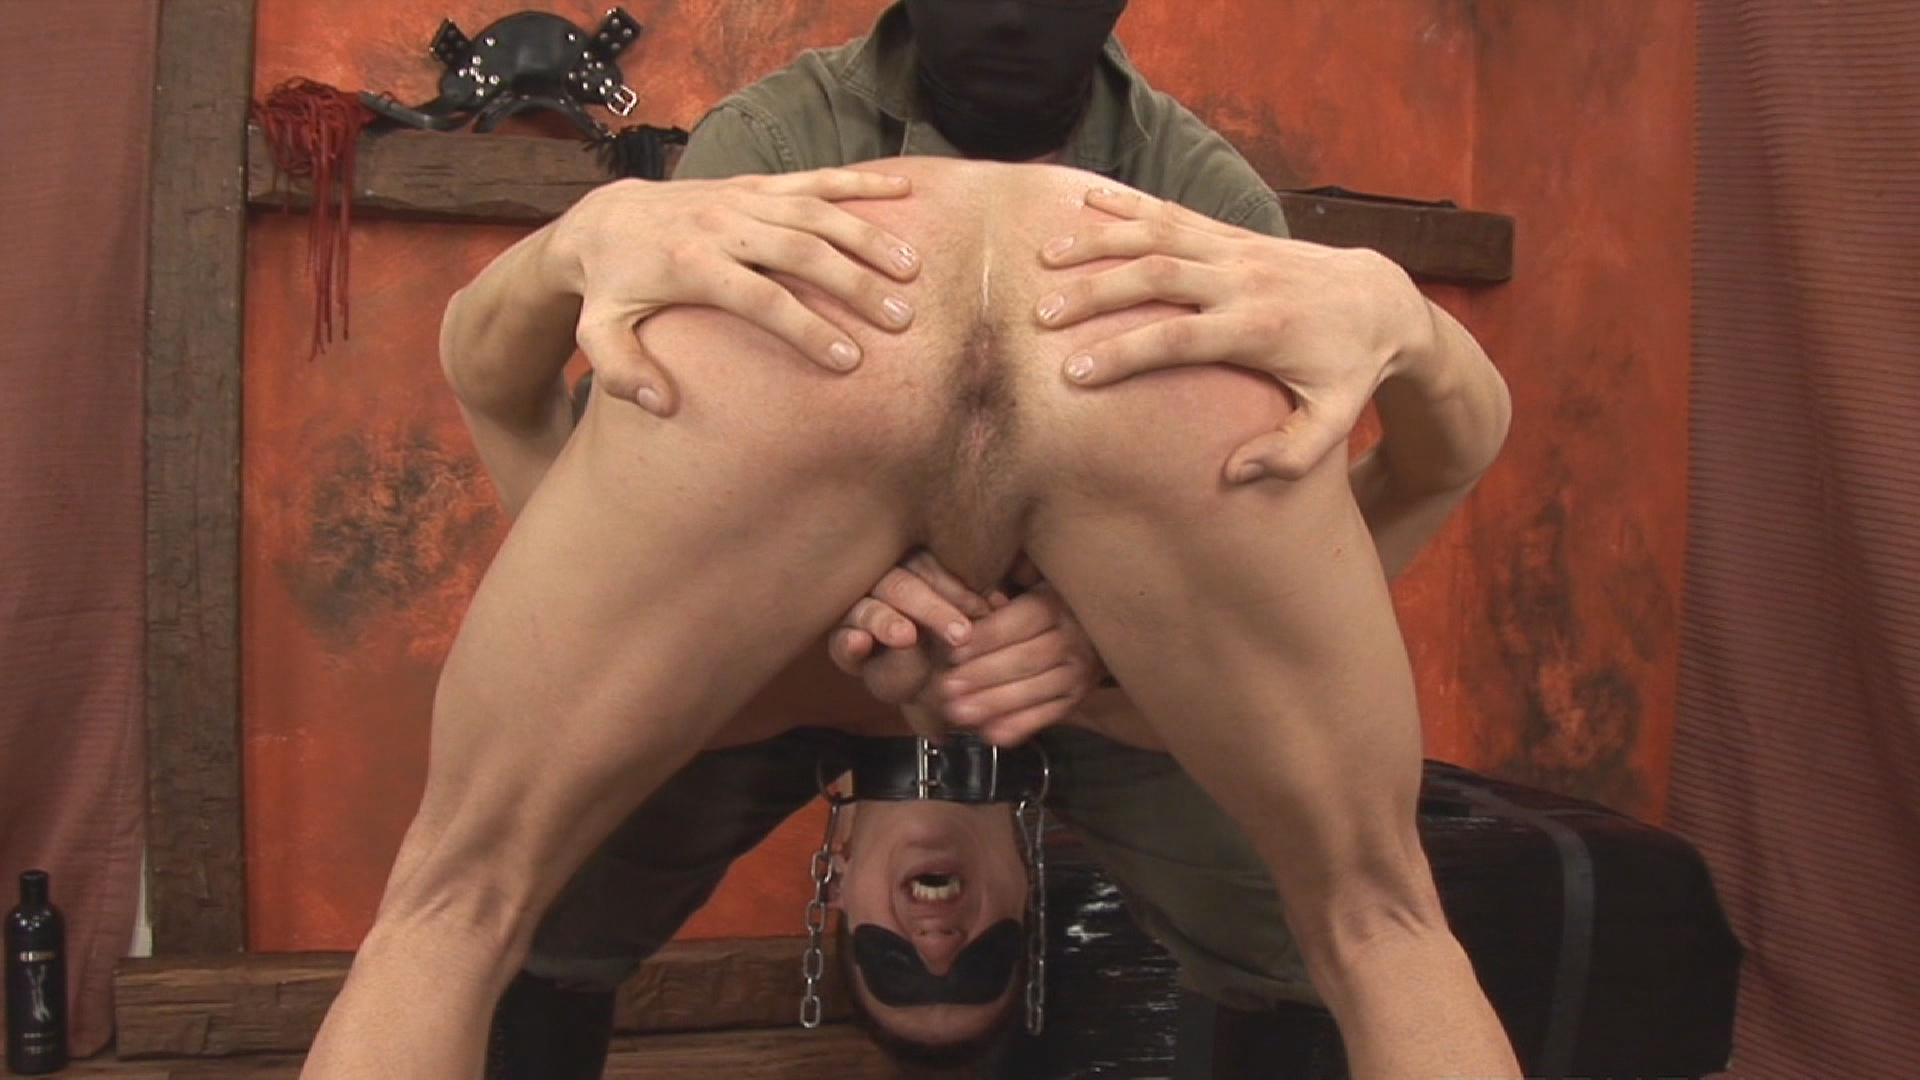 Spanking 24 Xvideo gay